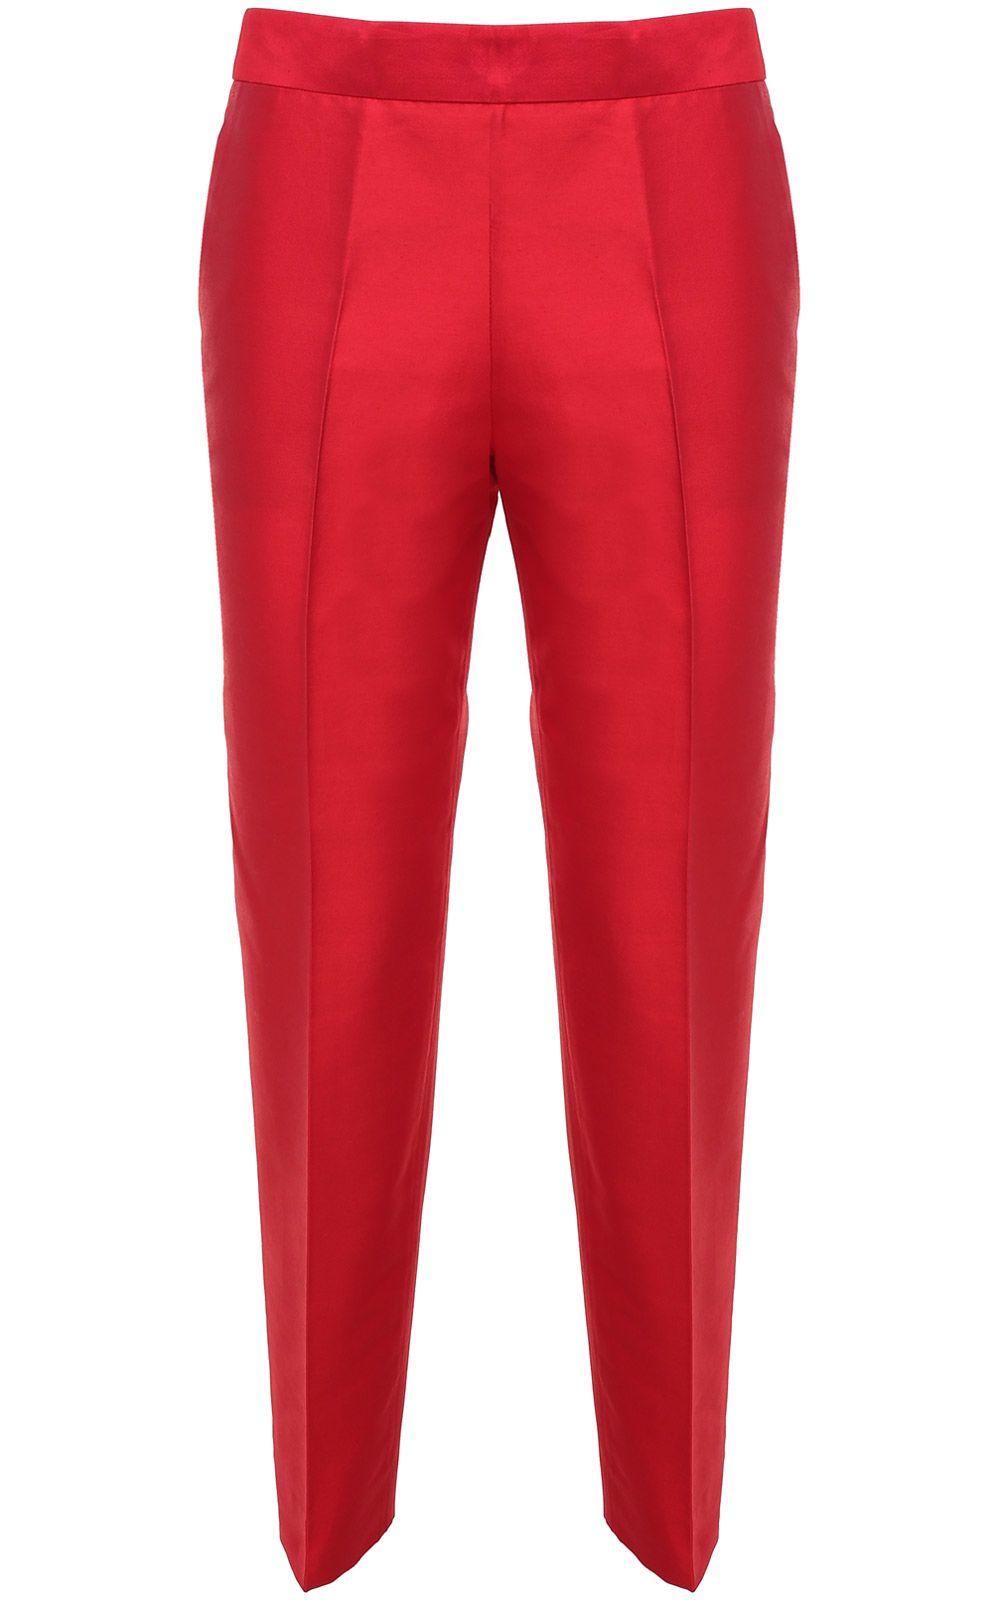 Shantung Pantalon Droit Alberto Biani TEAe7LiM